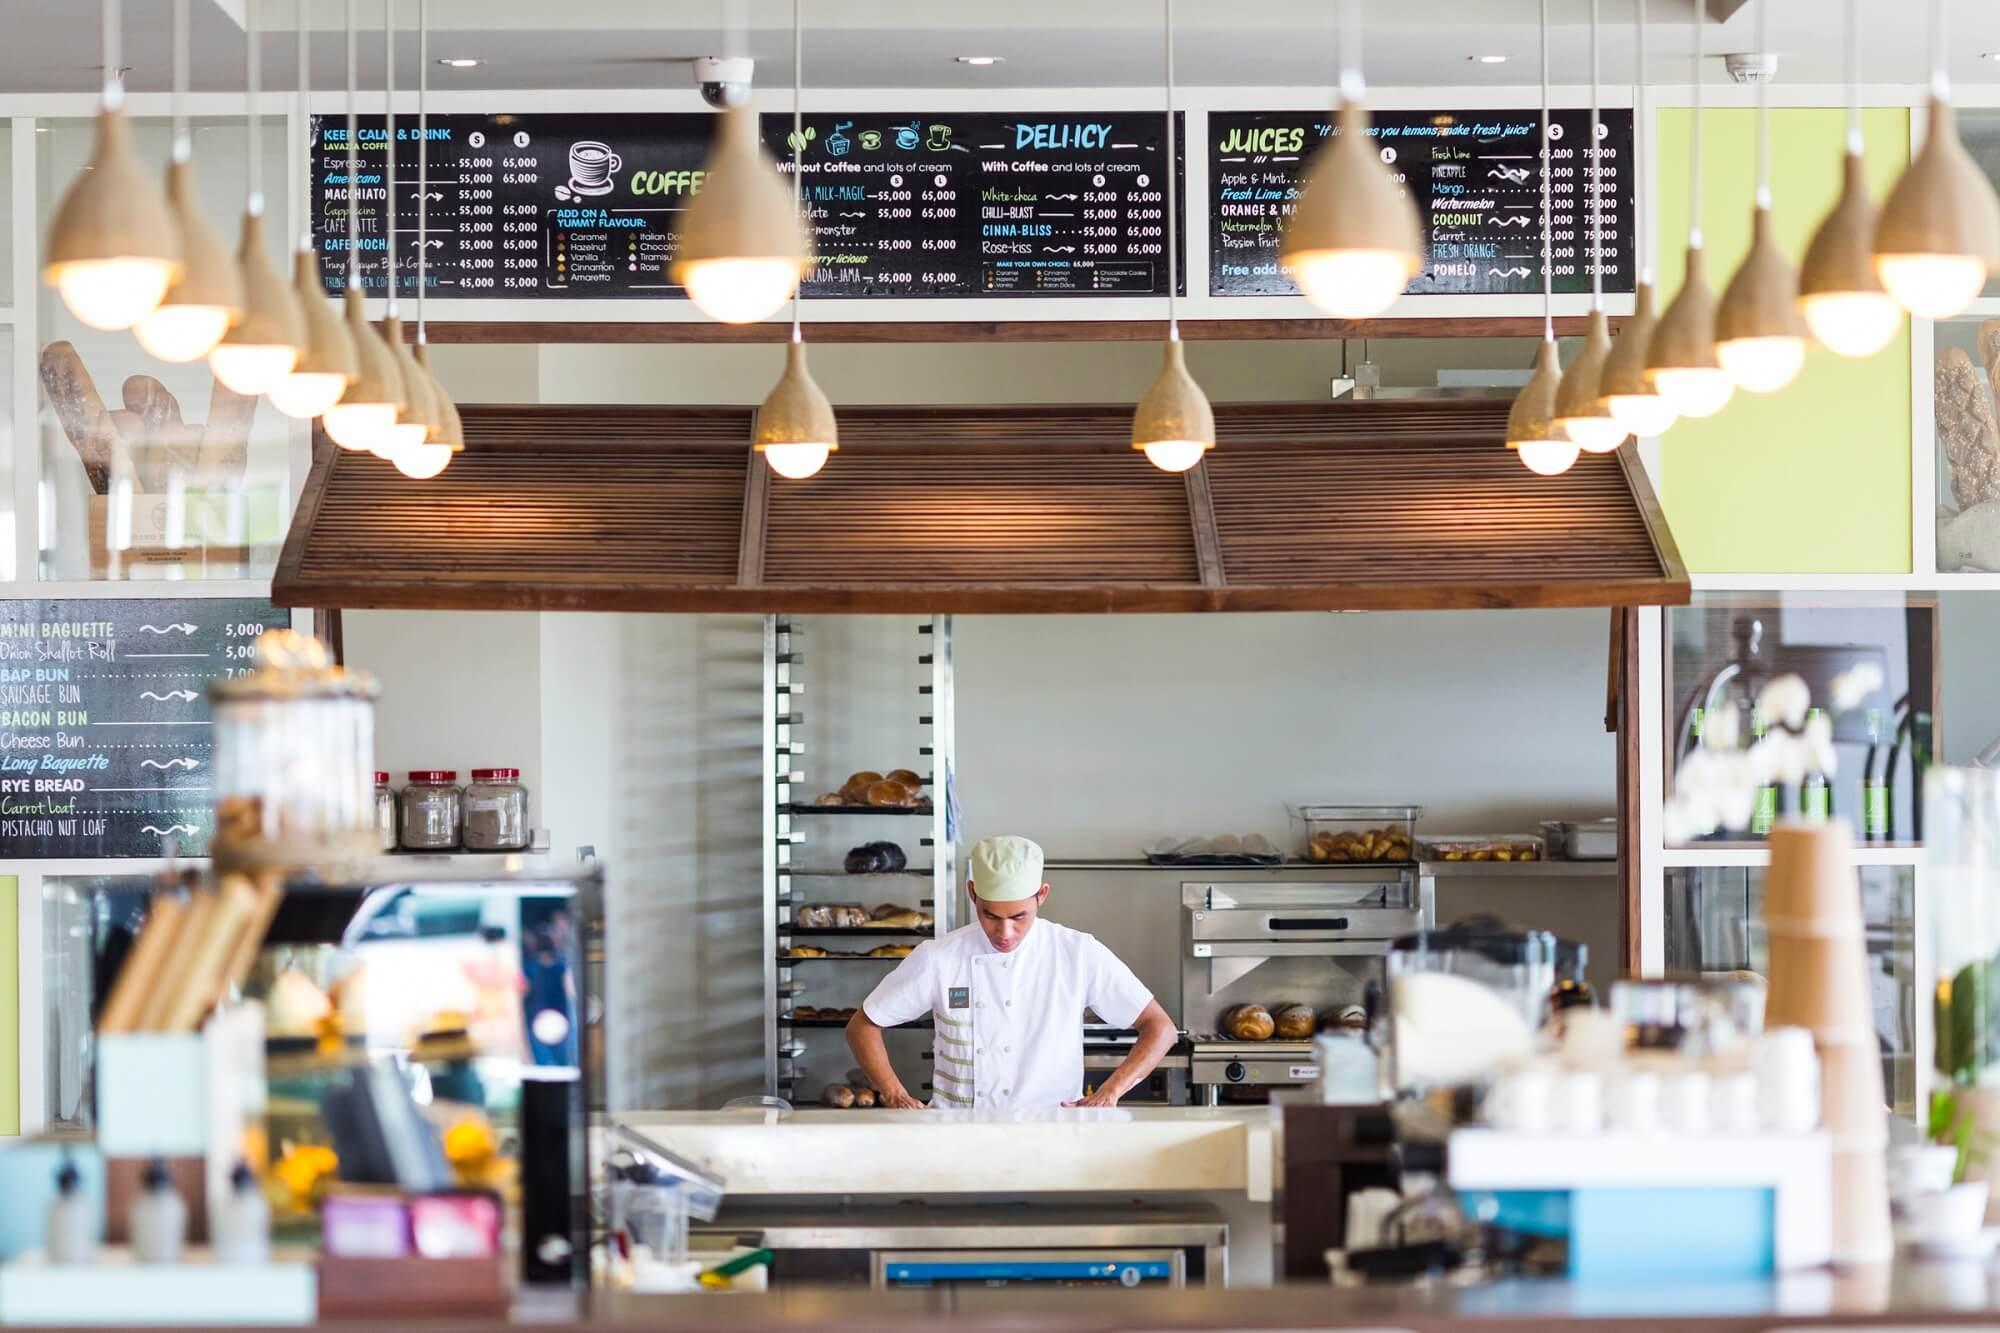 Delicious Cafe Bakery A La Carte Danang Beach Hotel 200 Vo Nguyen Giap Danang Fantasticity Com 04